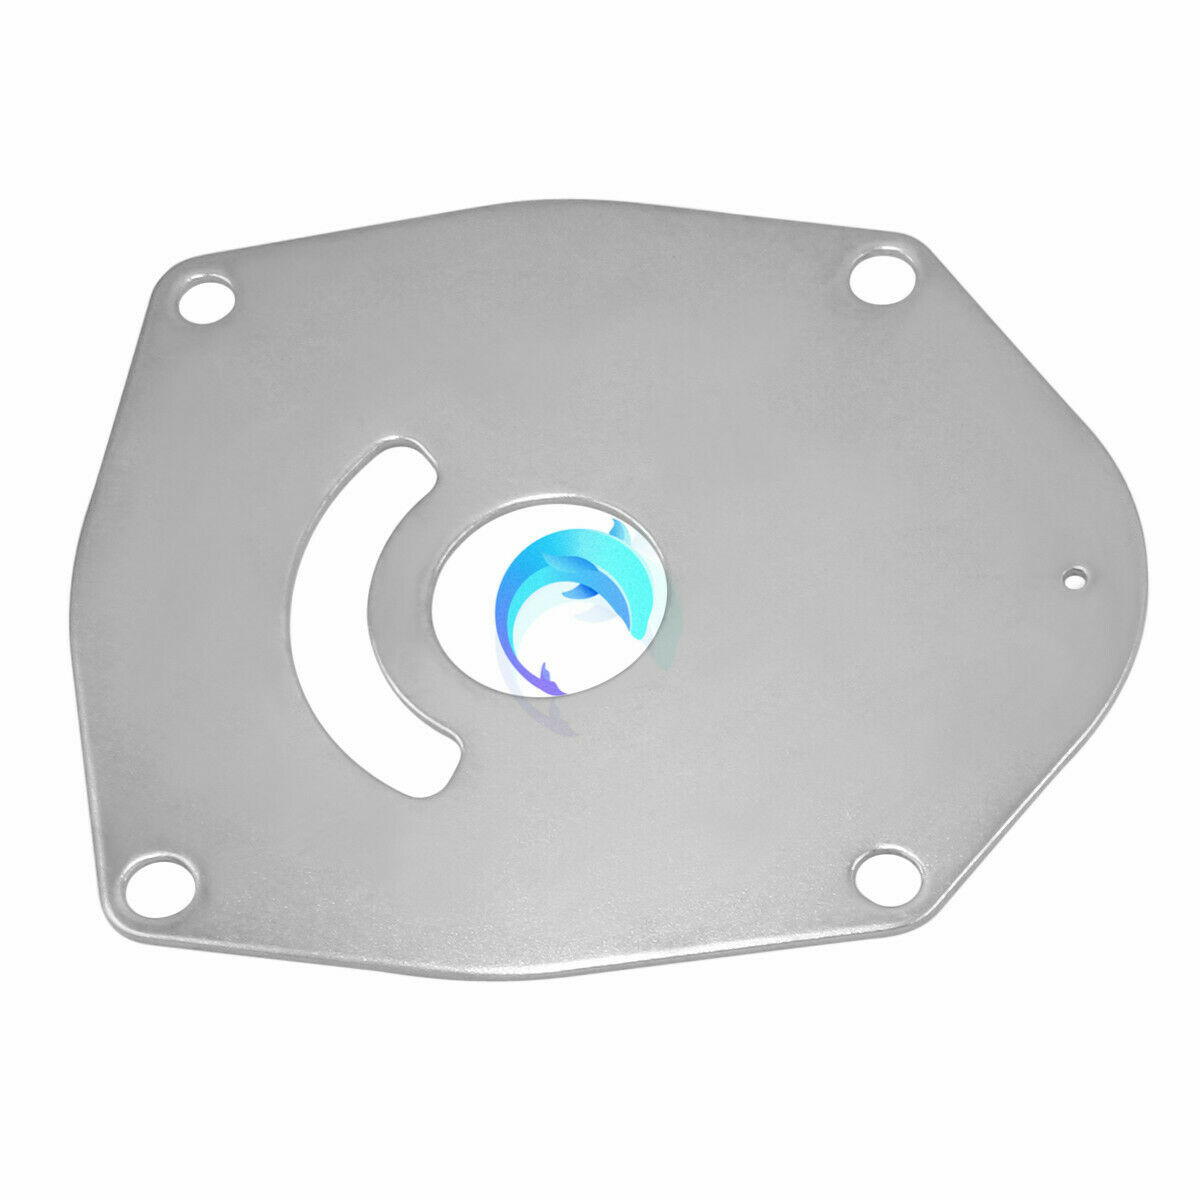 Full Power Plus Impeller Kit Replacement For Mercury Mercruiser Alpha One Gen Two 8M0100526 47-8M0100526